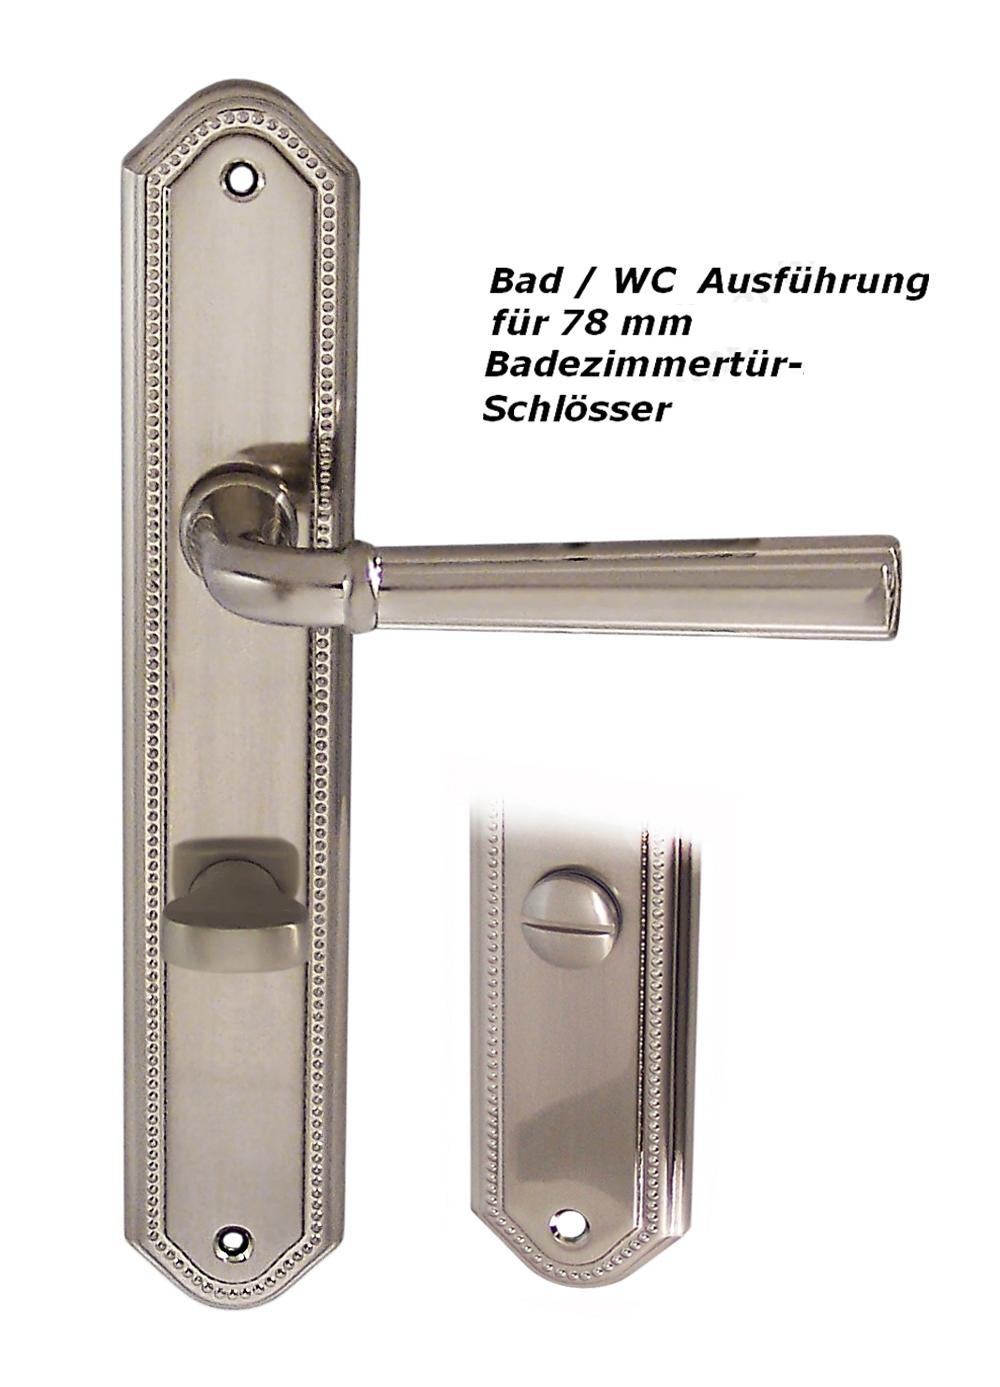 http://www.nbkweb.de/ebay/beschlag/bellevue-ls-nimatt-4.jpg